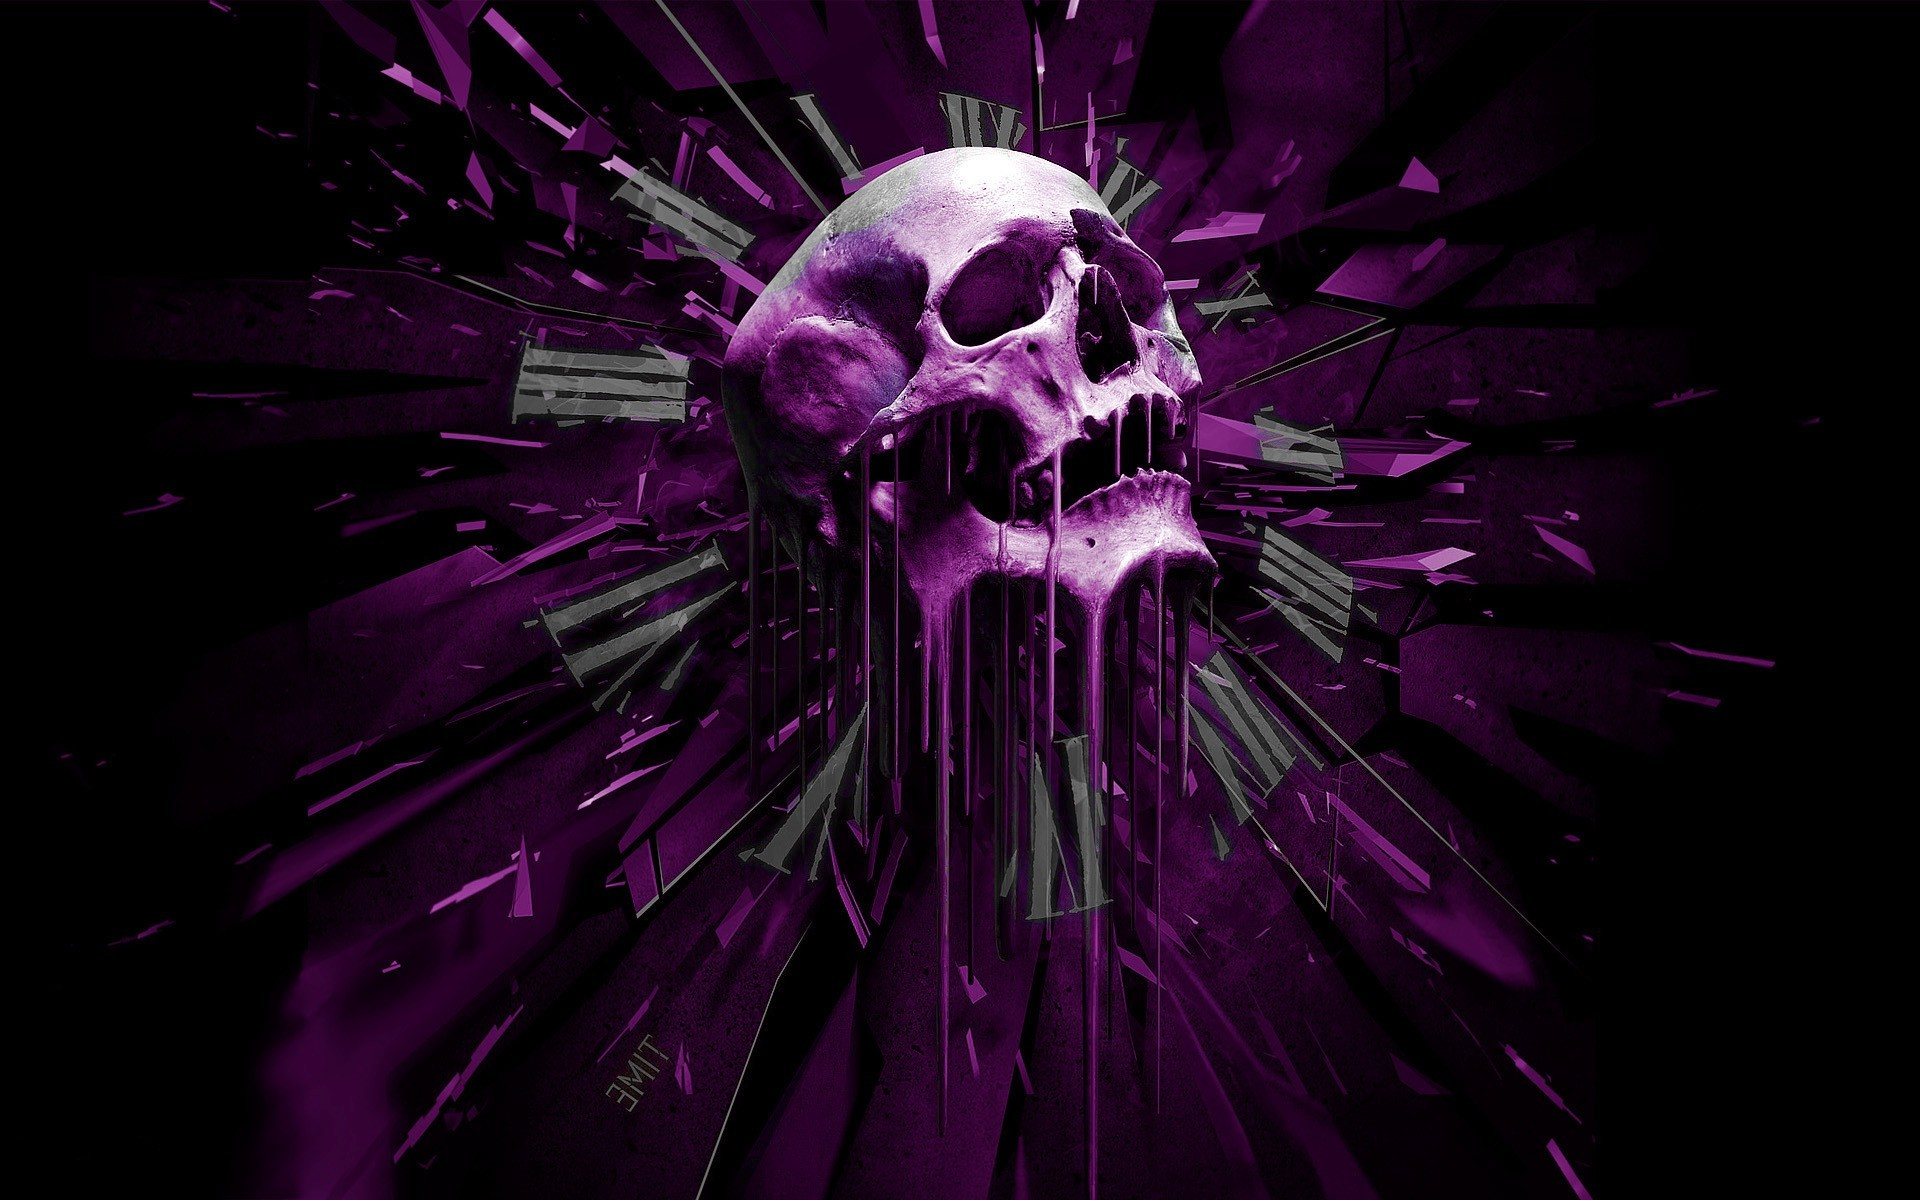 Purple Wallpapers 12 Best Wallpapers Collection Desktop: Abstract Skull Wallpaper (73+ Images